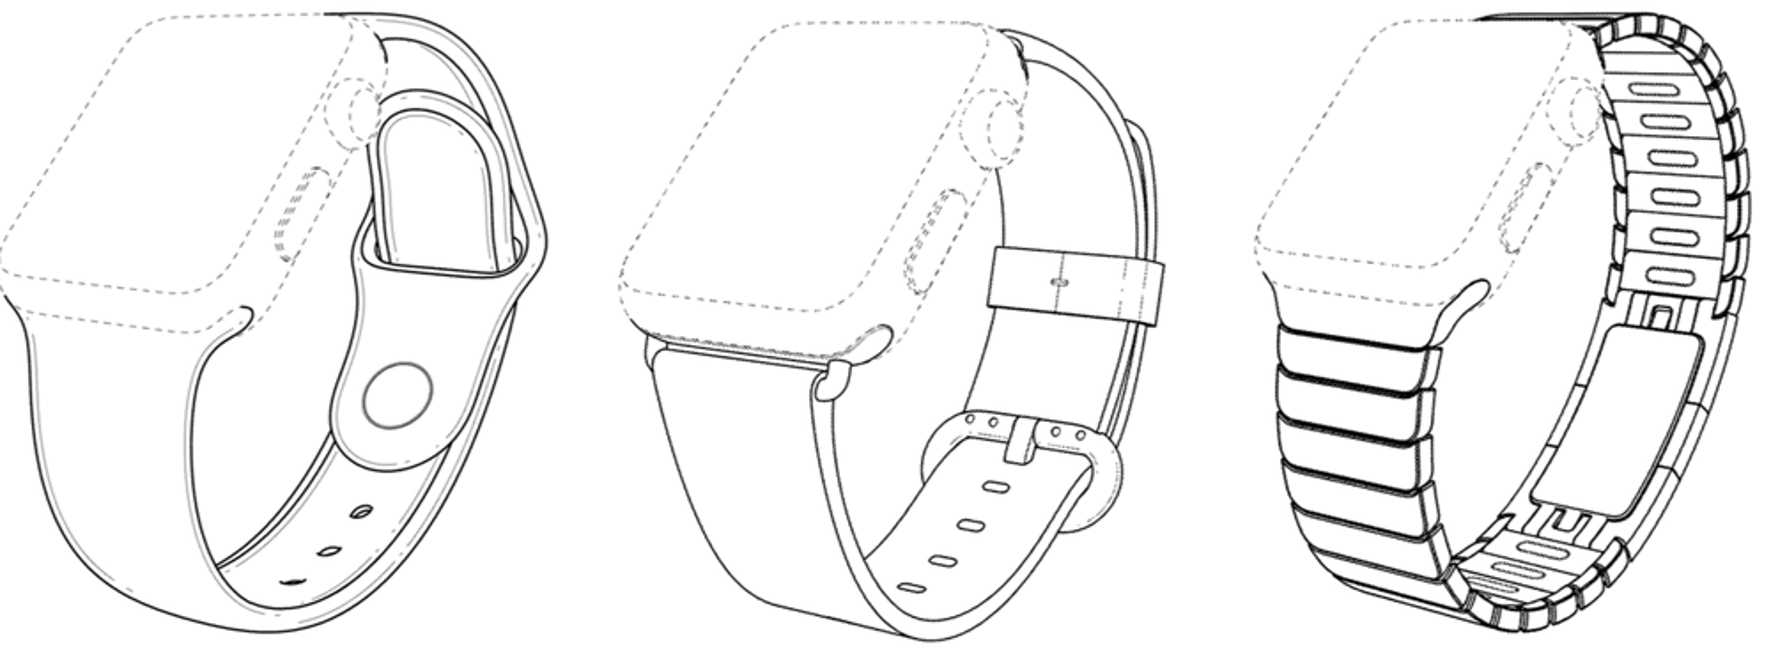 Apple Watch brevet bratari